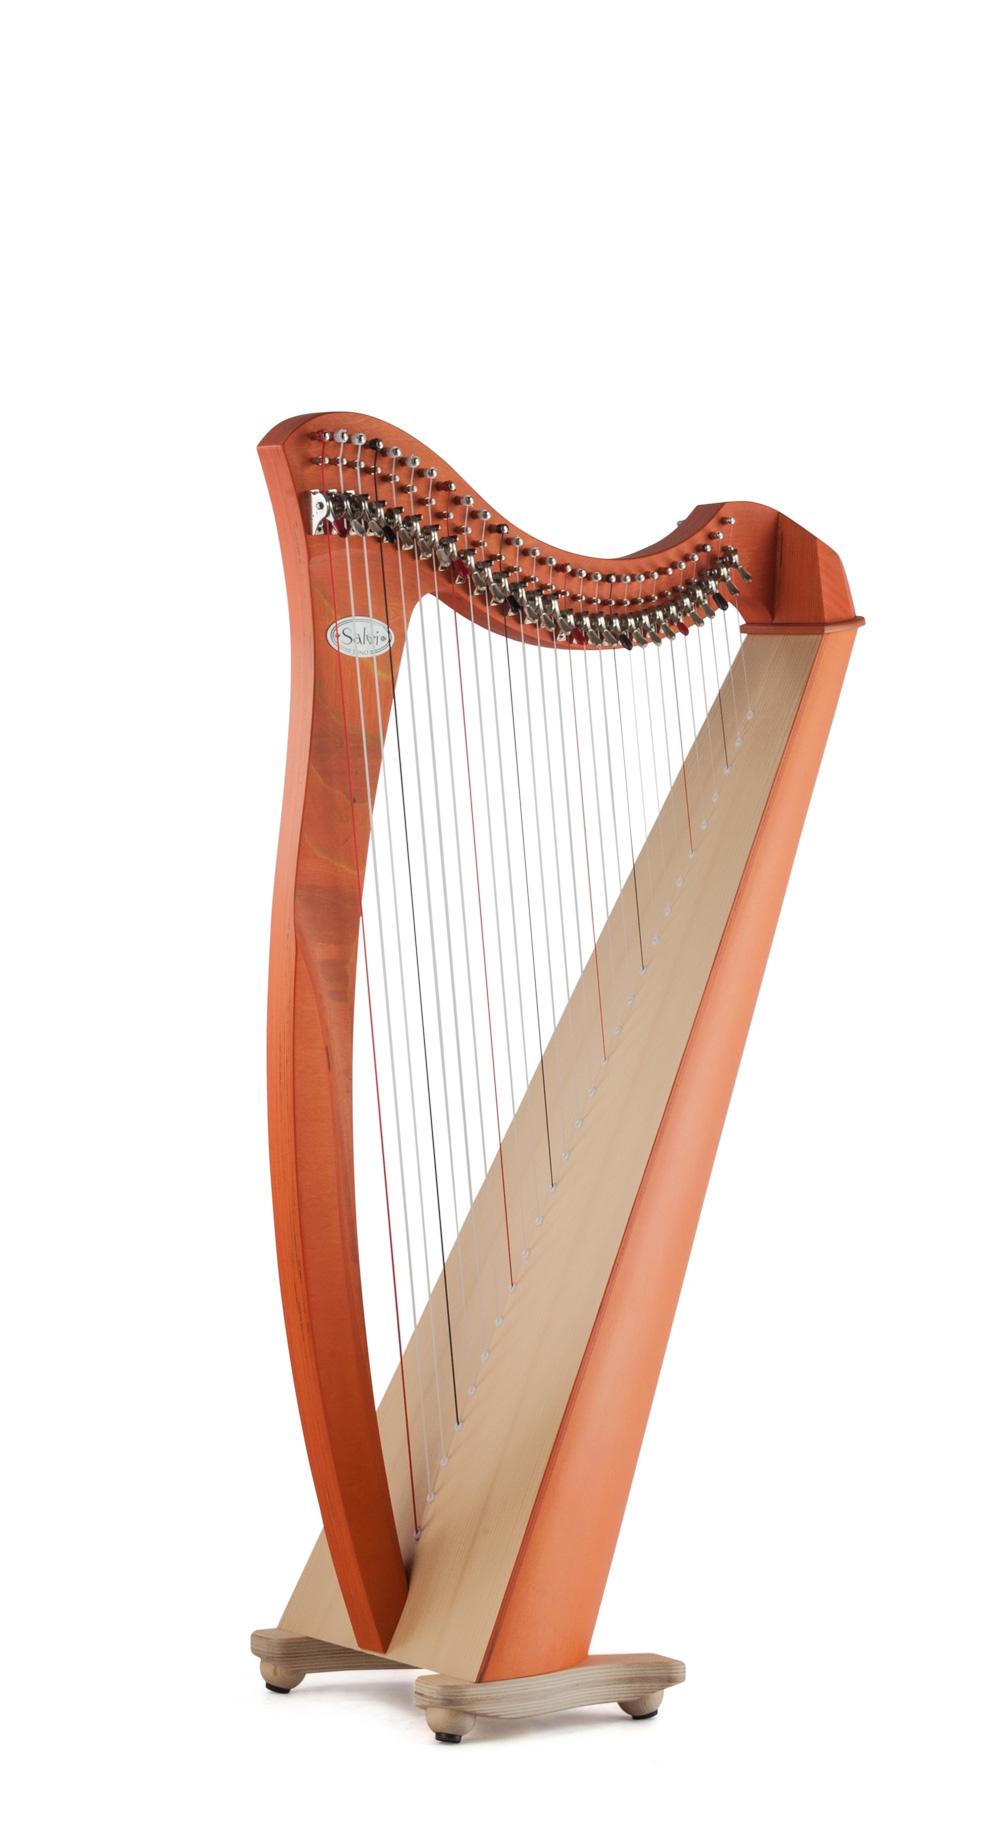 Salvi Lever Harp